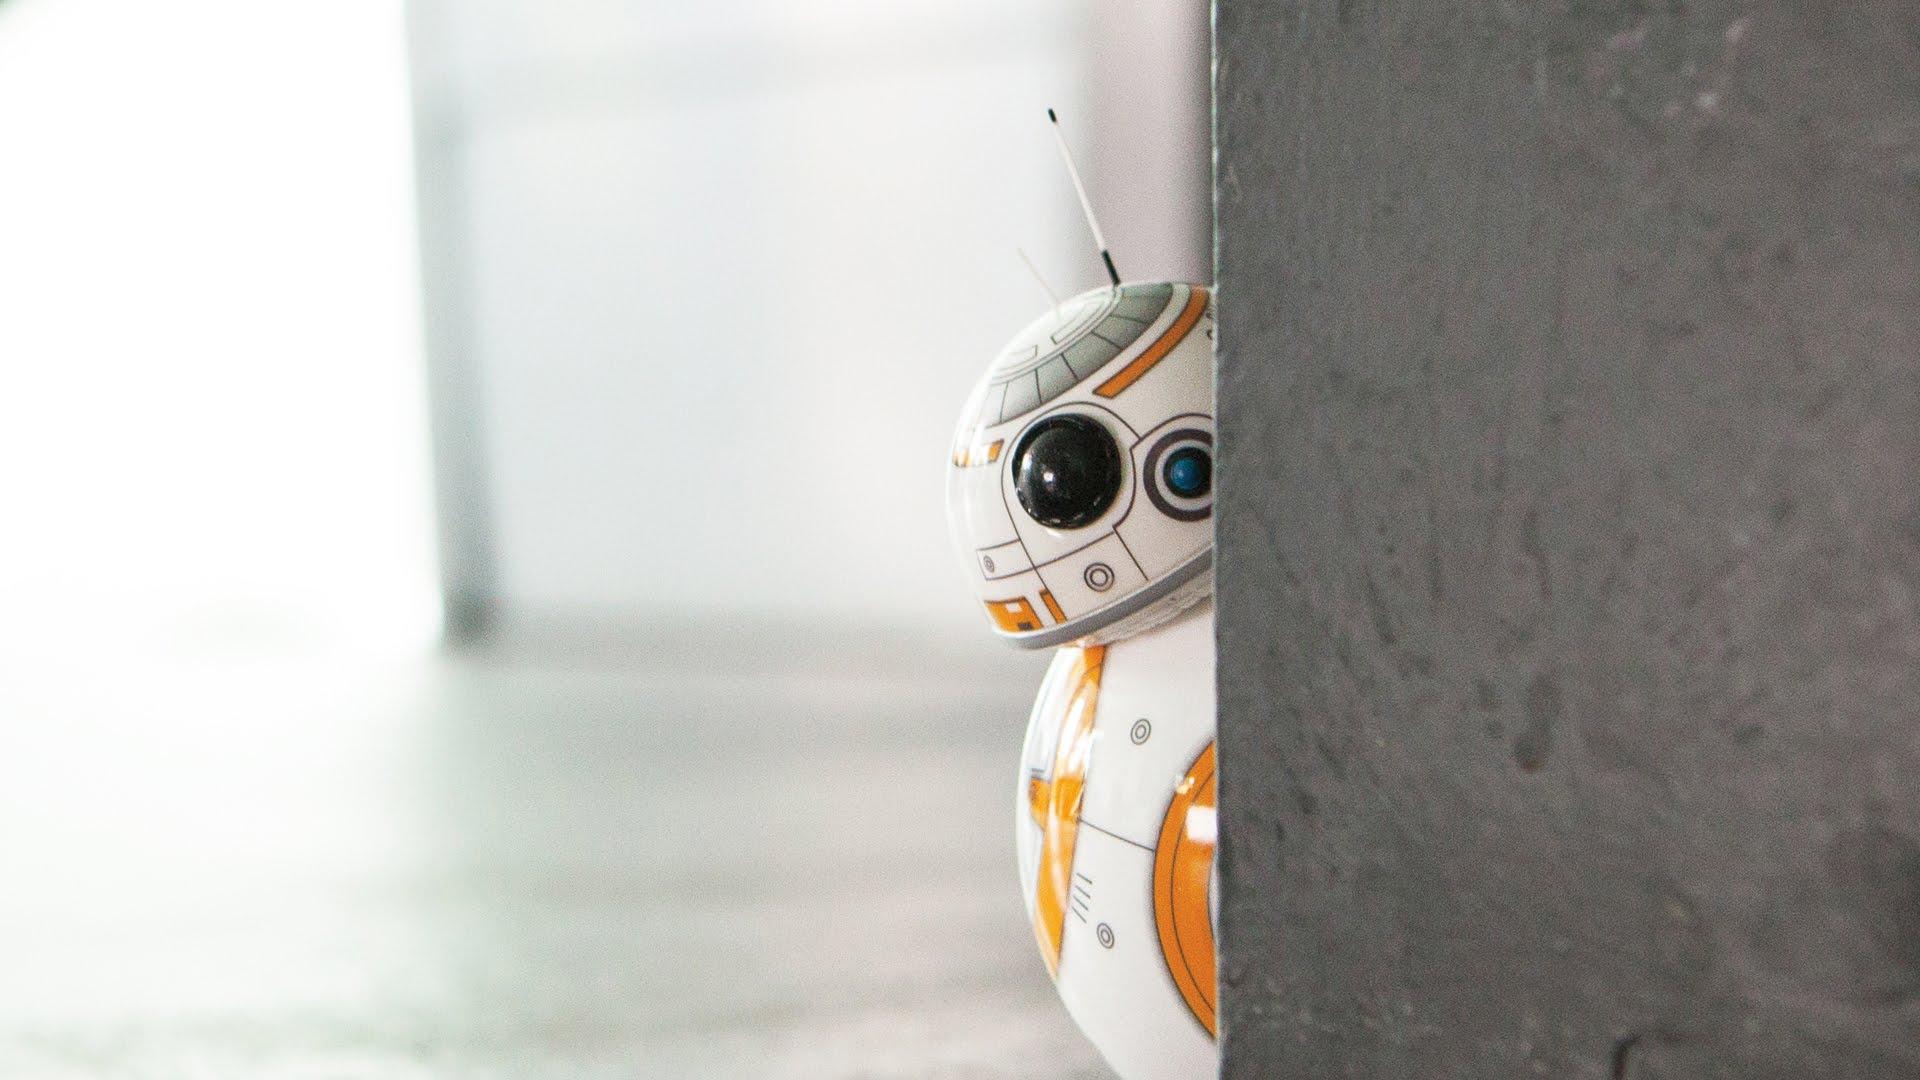 49+] Star Wars iPhone Wallpaper BB8 on